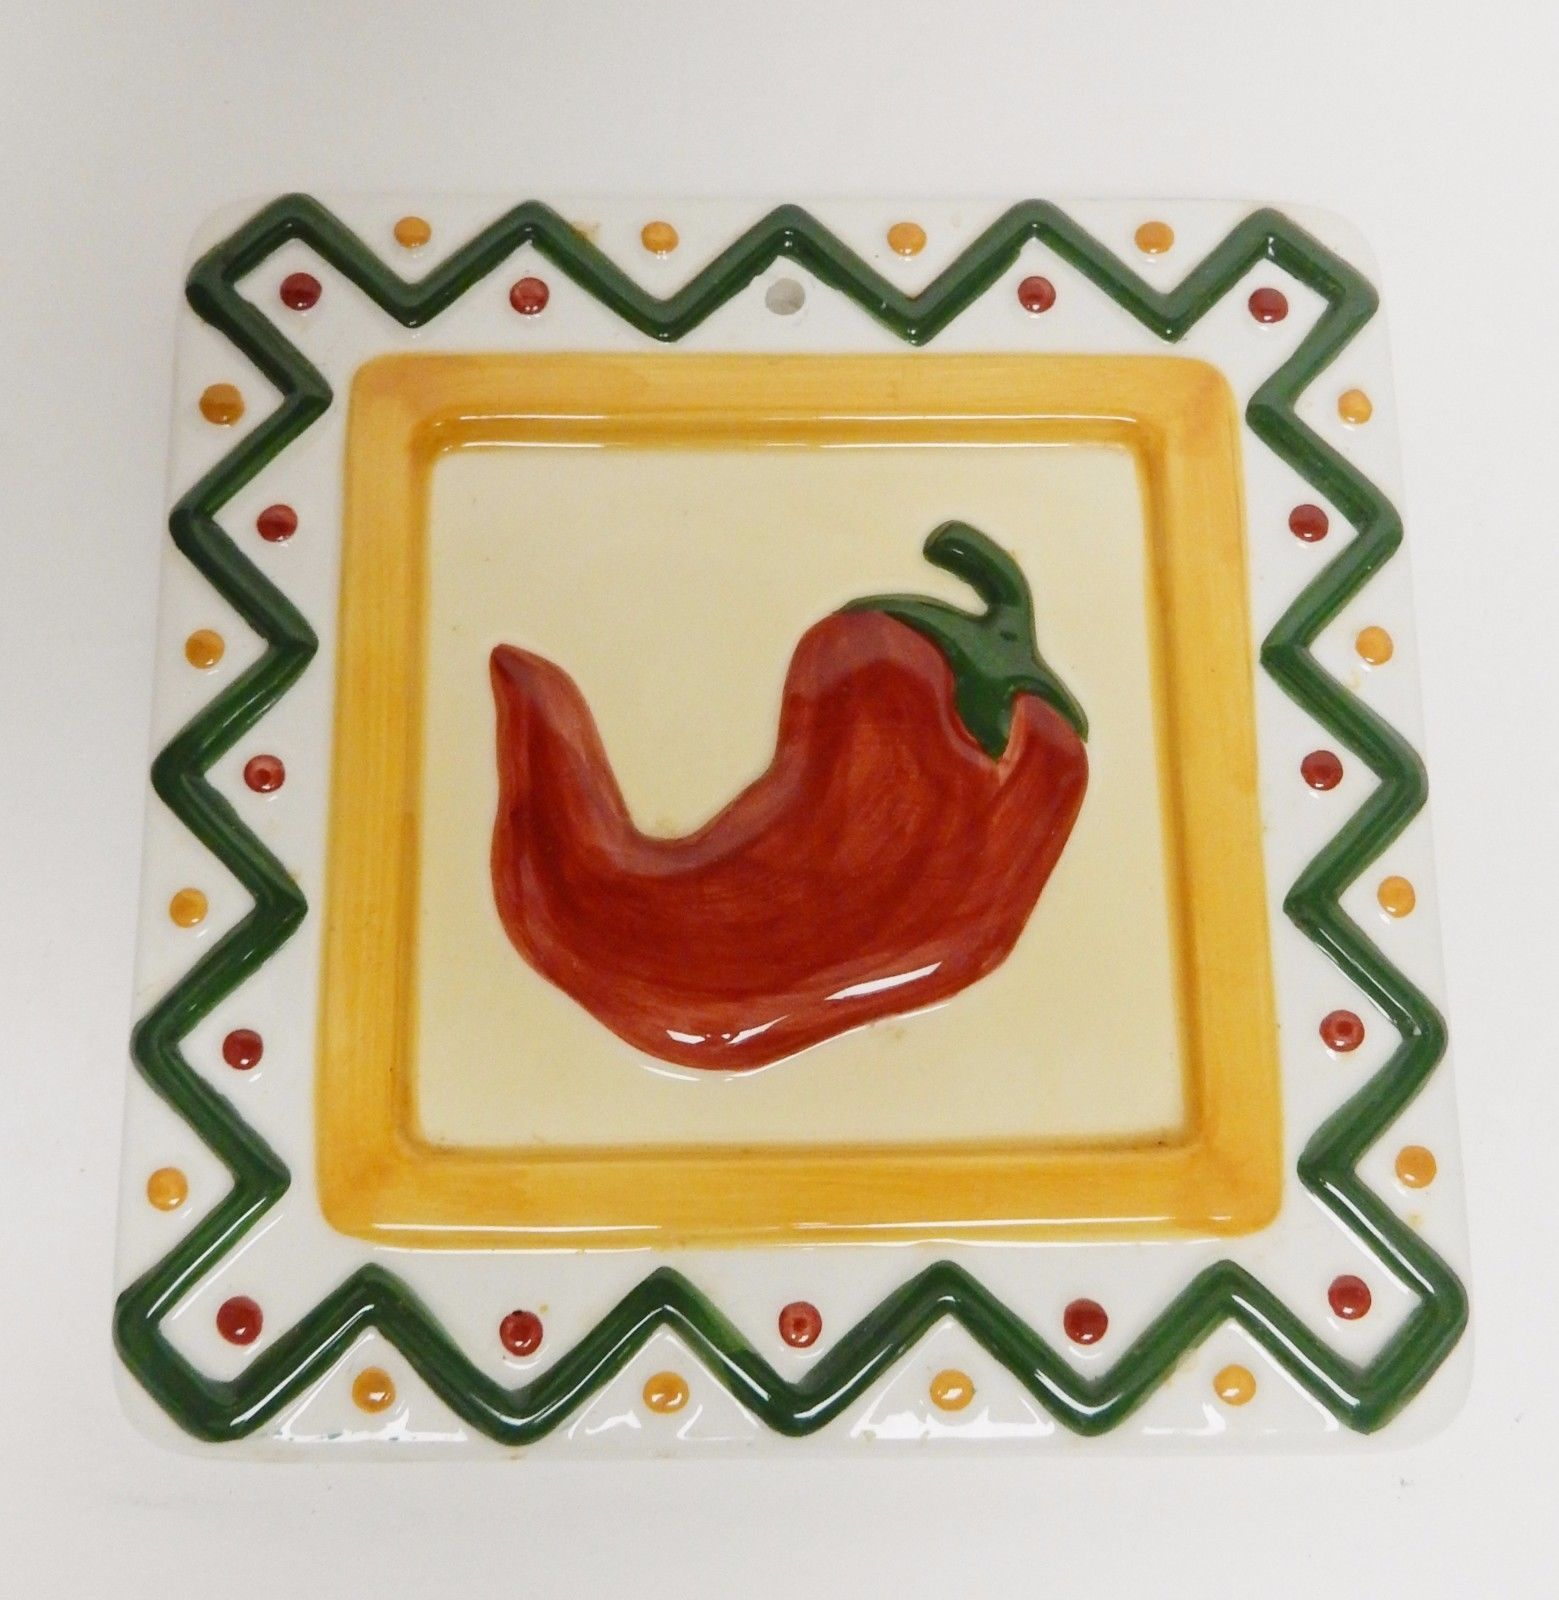 Clay Art Chili Pepper Ceramic Trivet Dish and 50 similar items